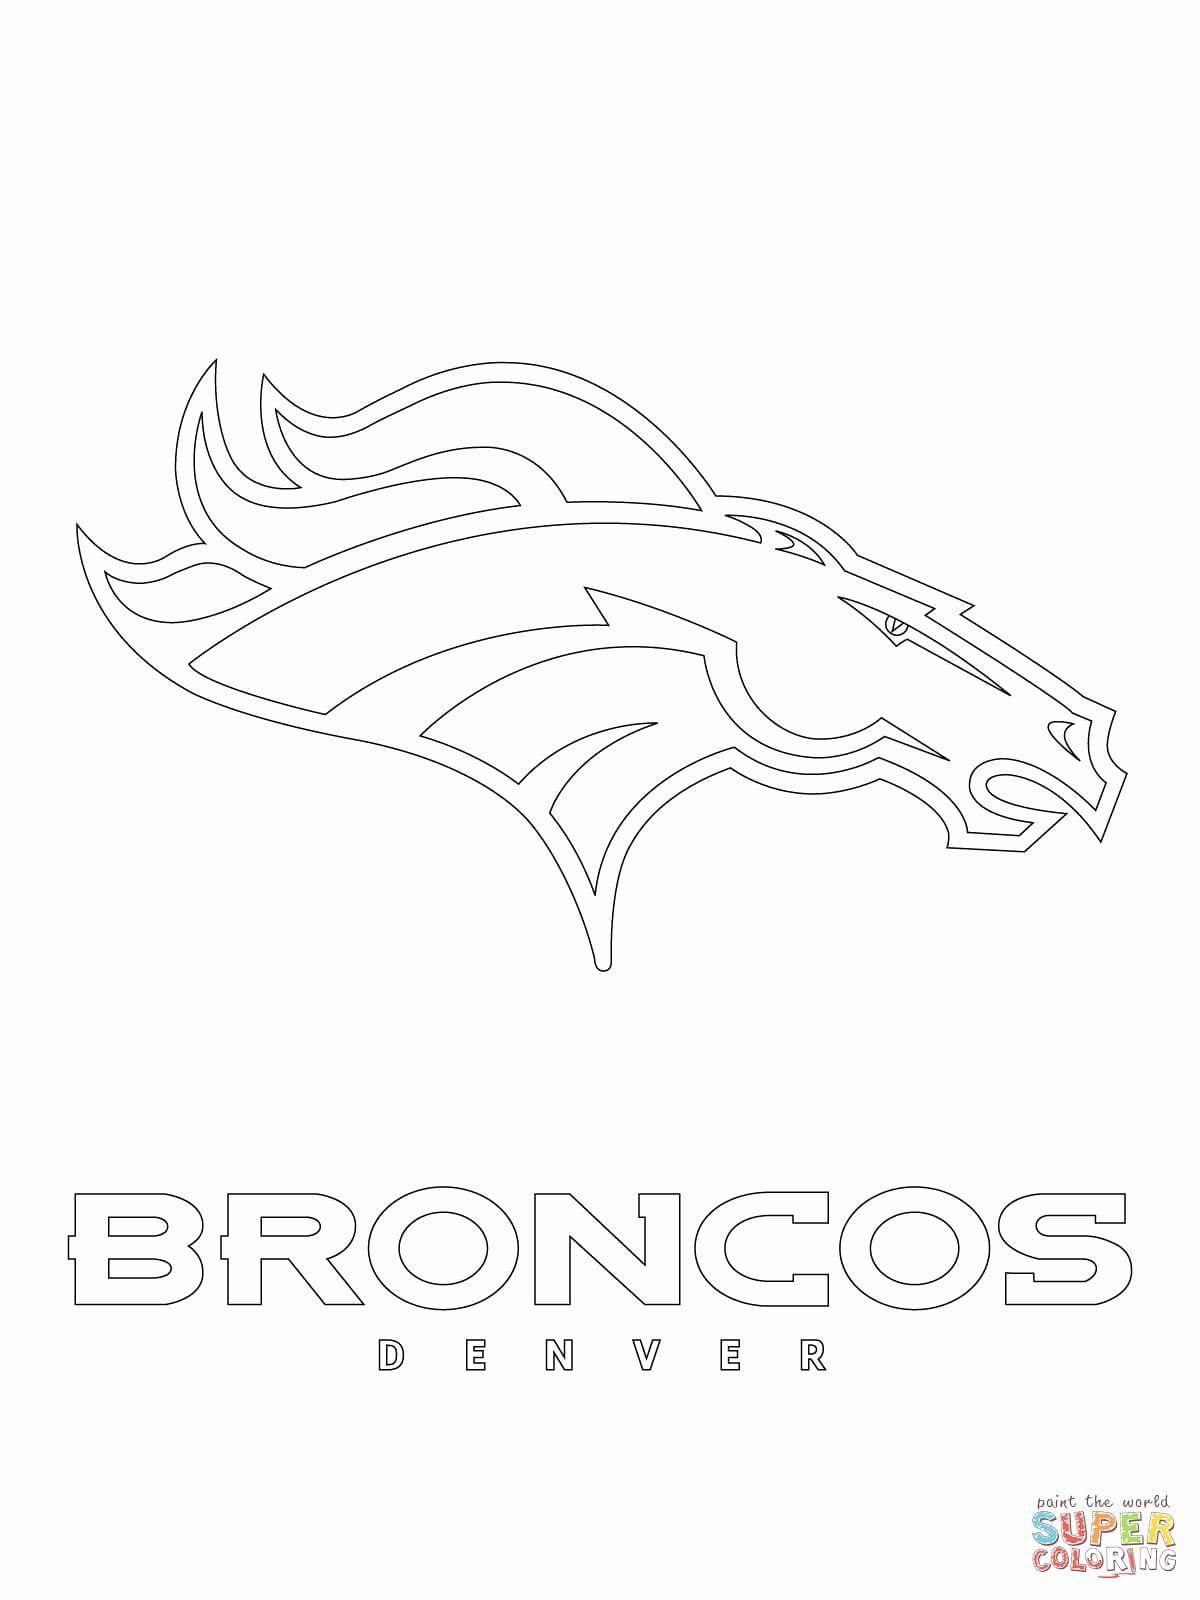 Denver Broncos Coloring Page New Denver Broncos Logo Coloring Page In 2020 Broncos Logo Denver Broncos Broncos